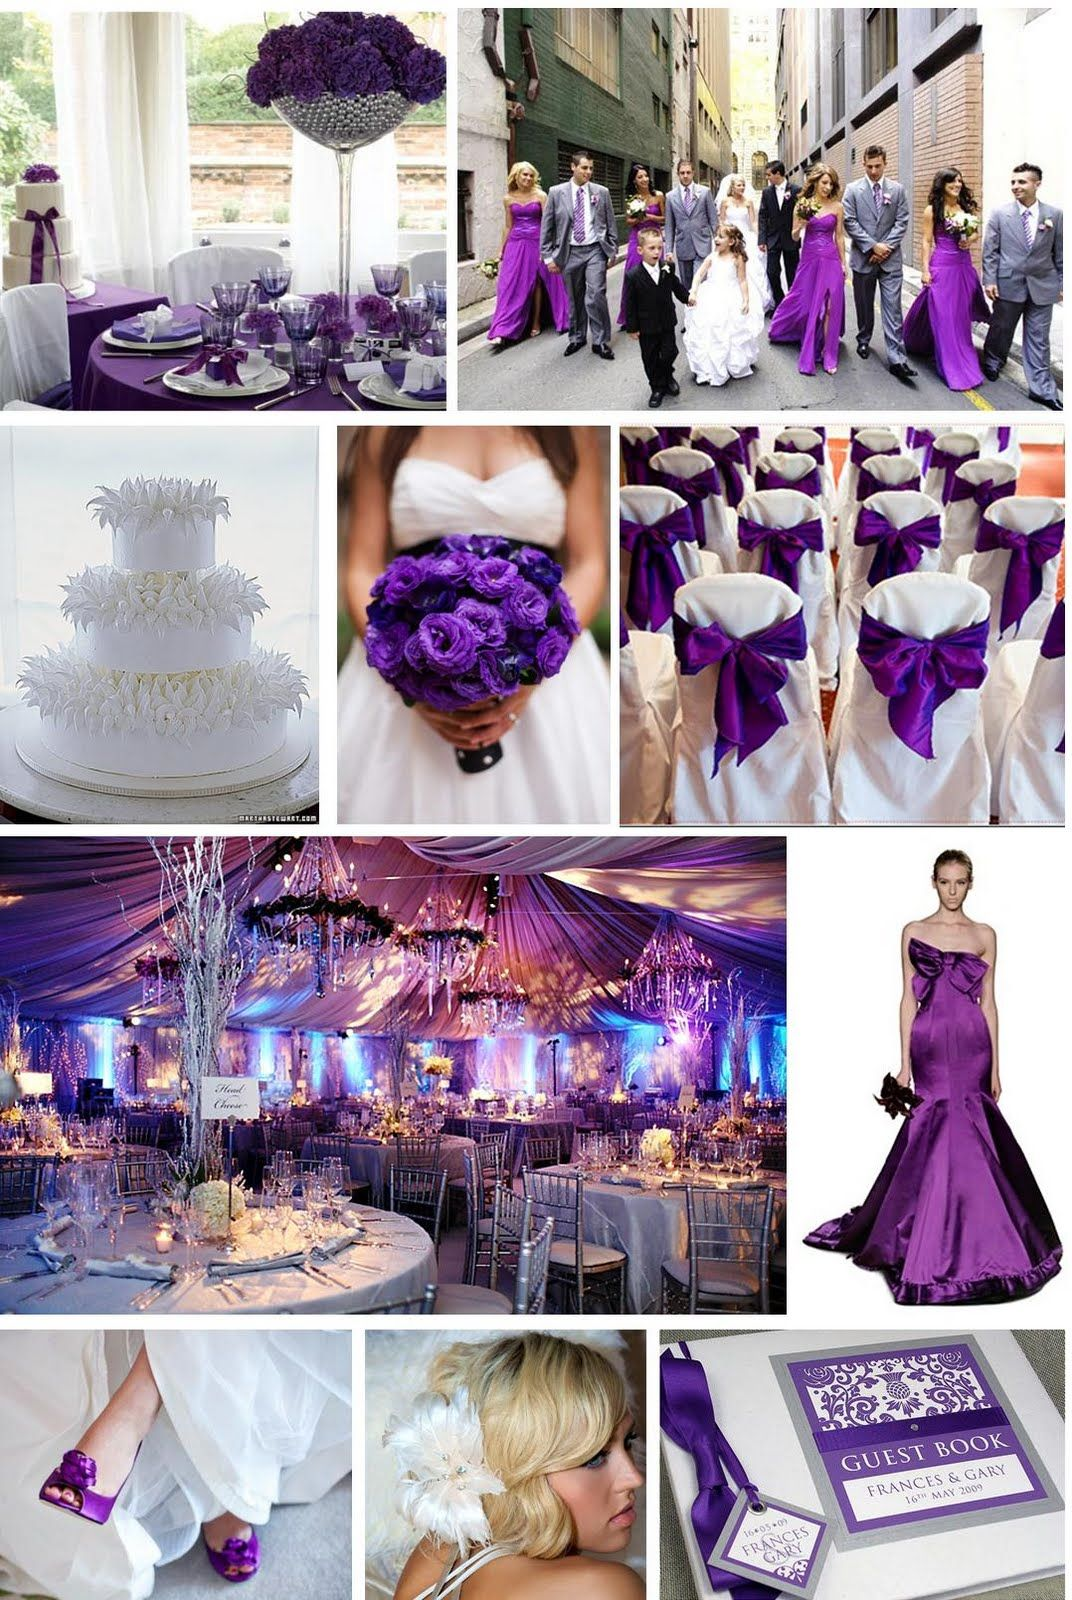 Wedding decoration ideas purple  Purple wedding  Blue and purple wedding ideas  Pinterest  Purple